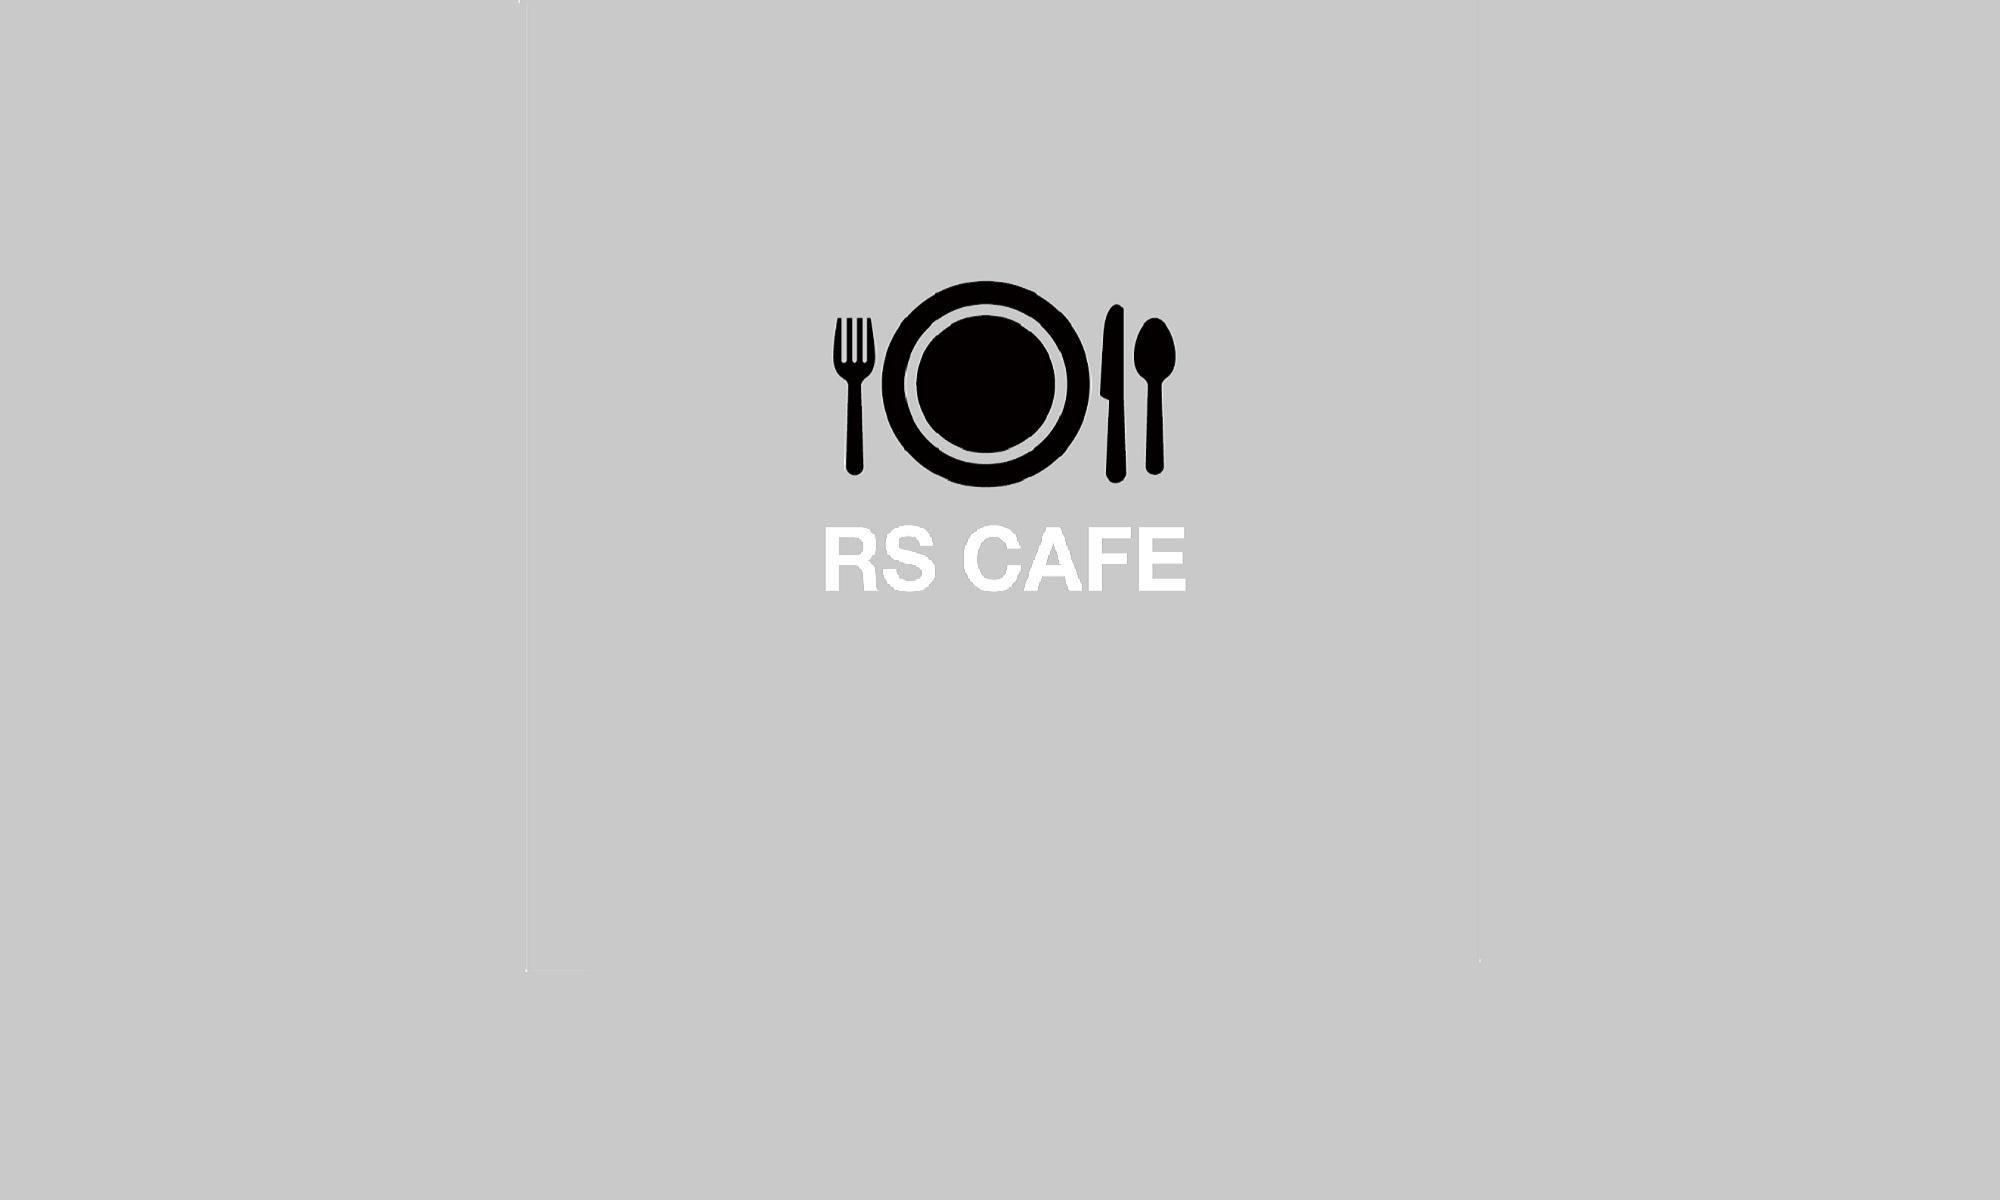 rscafe